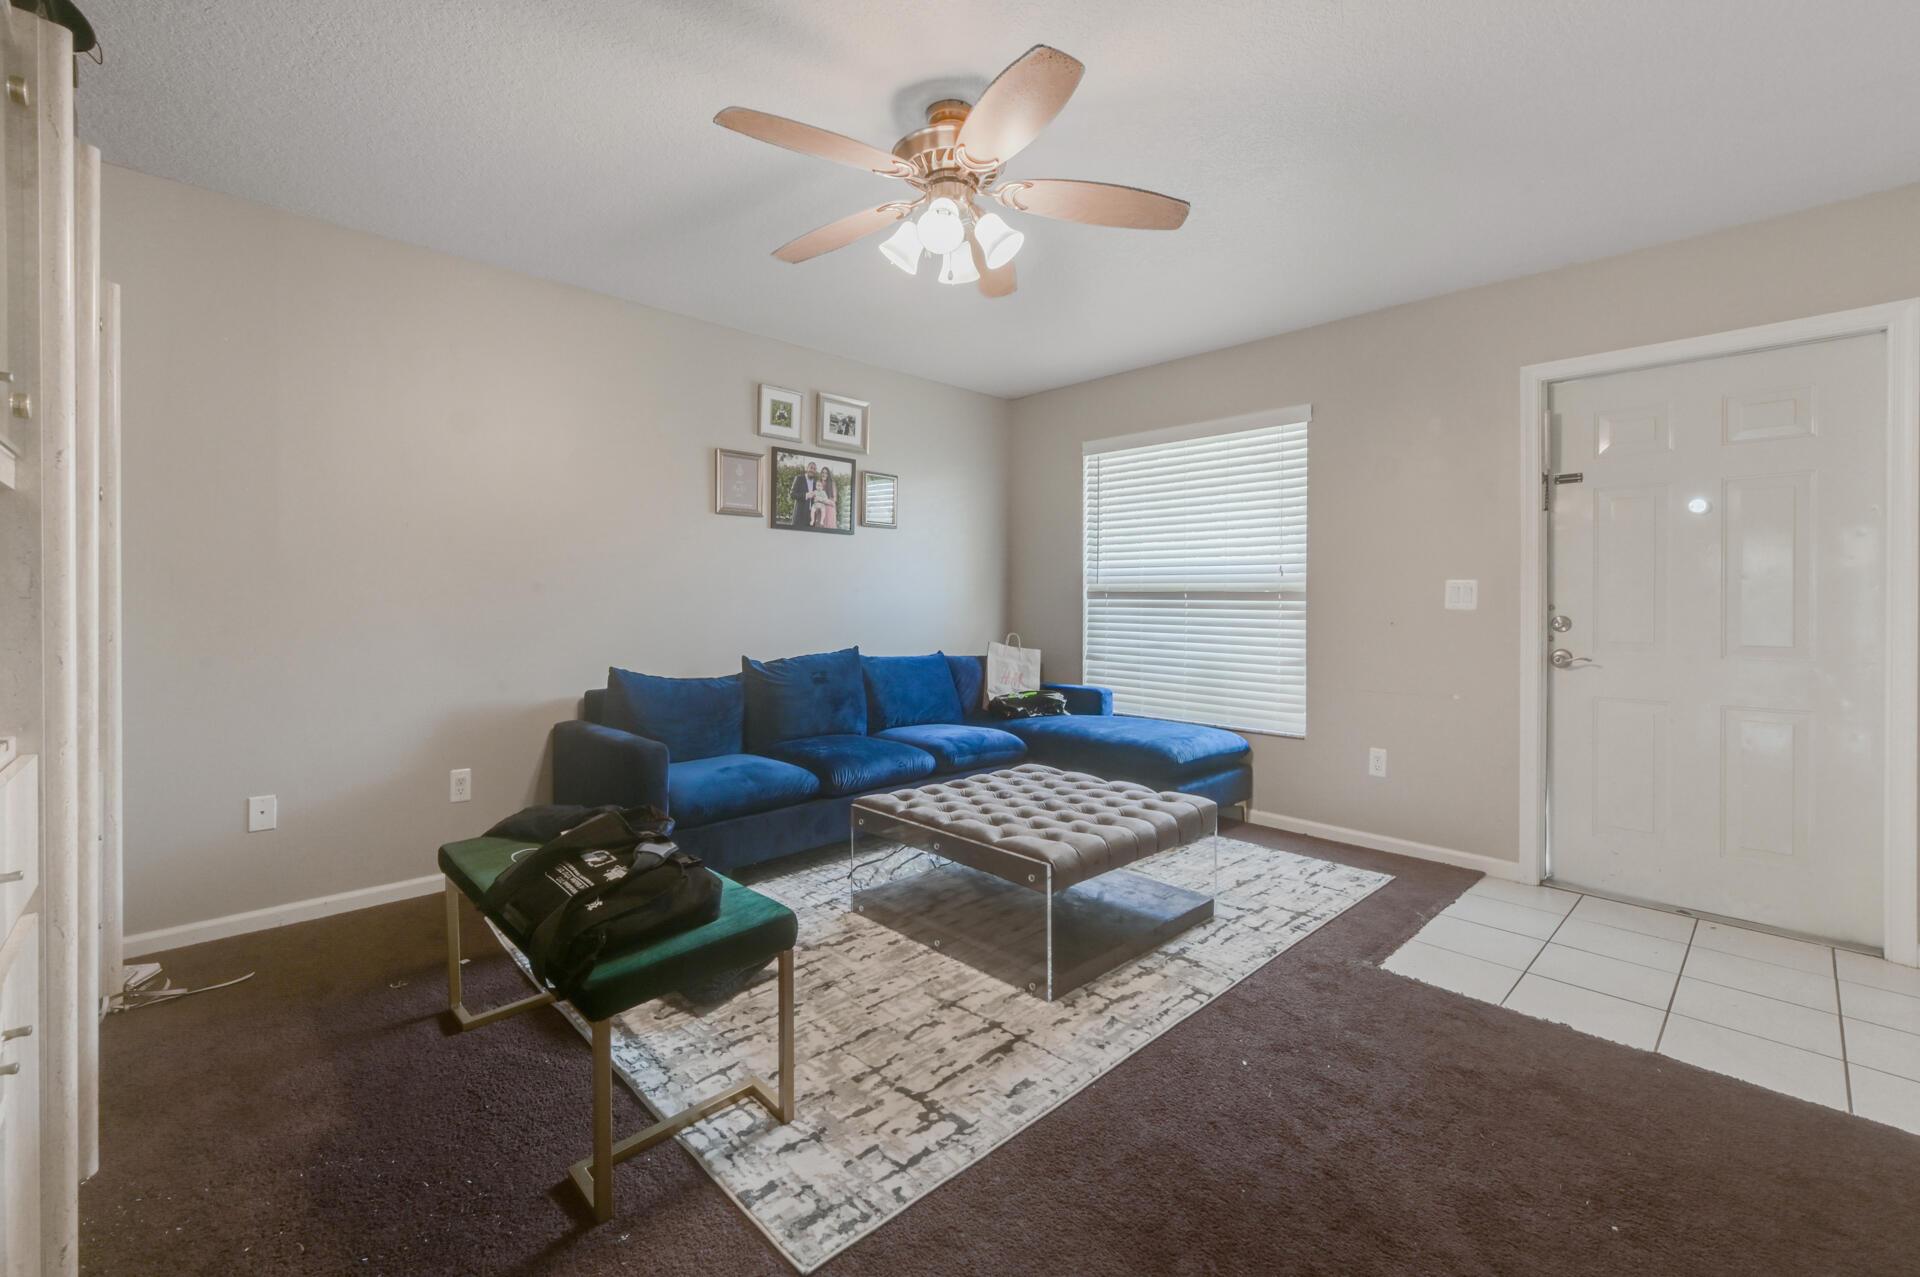 02 Living Room_004